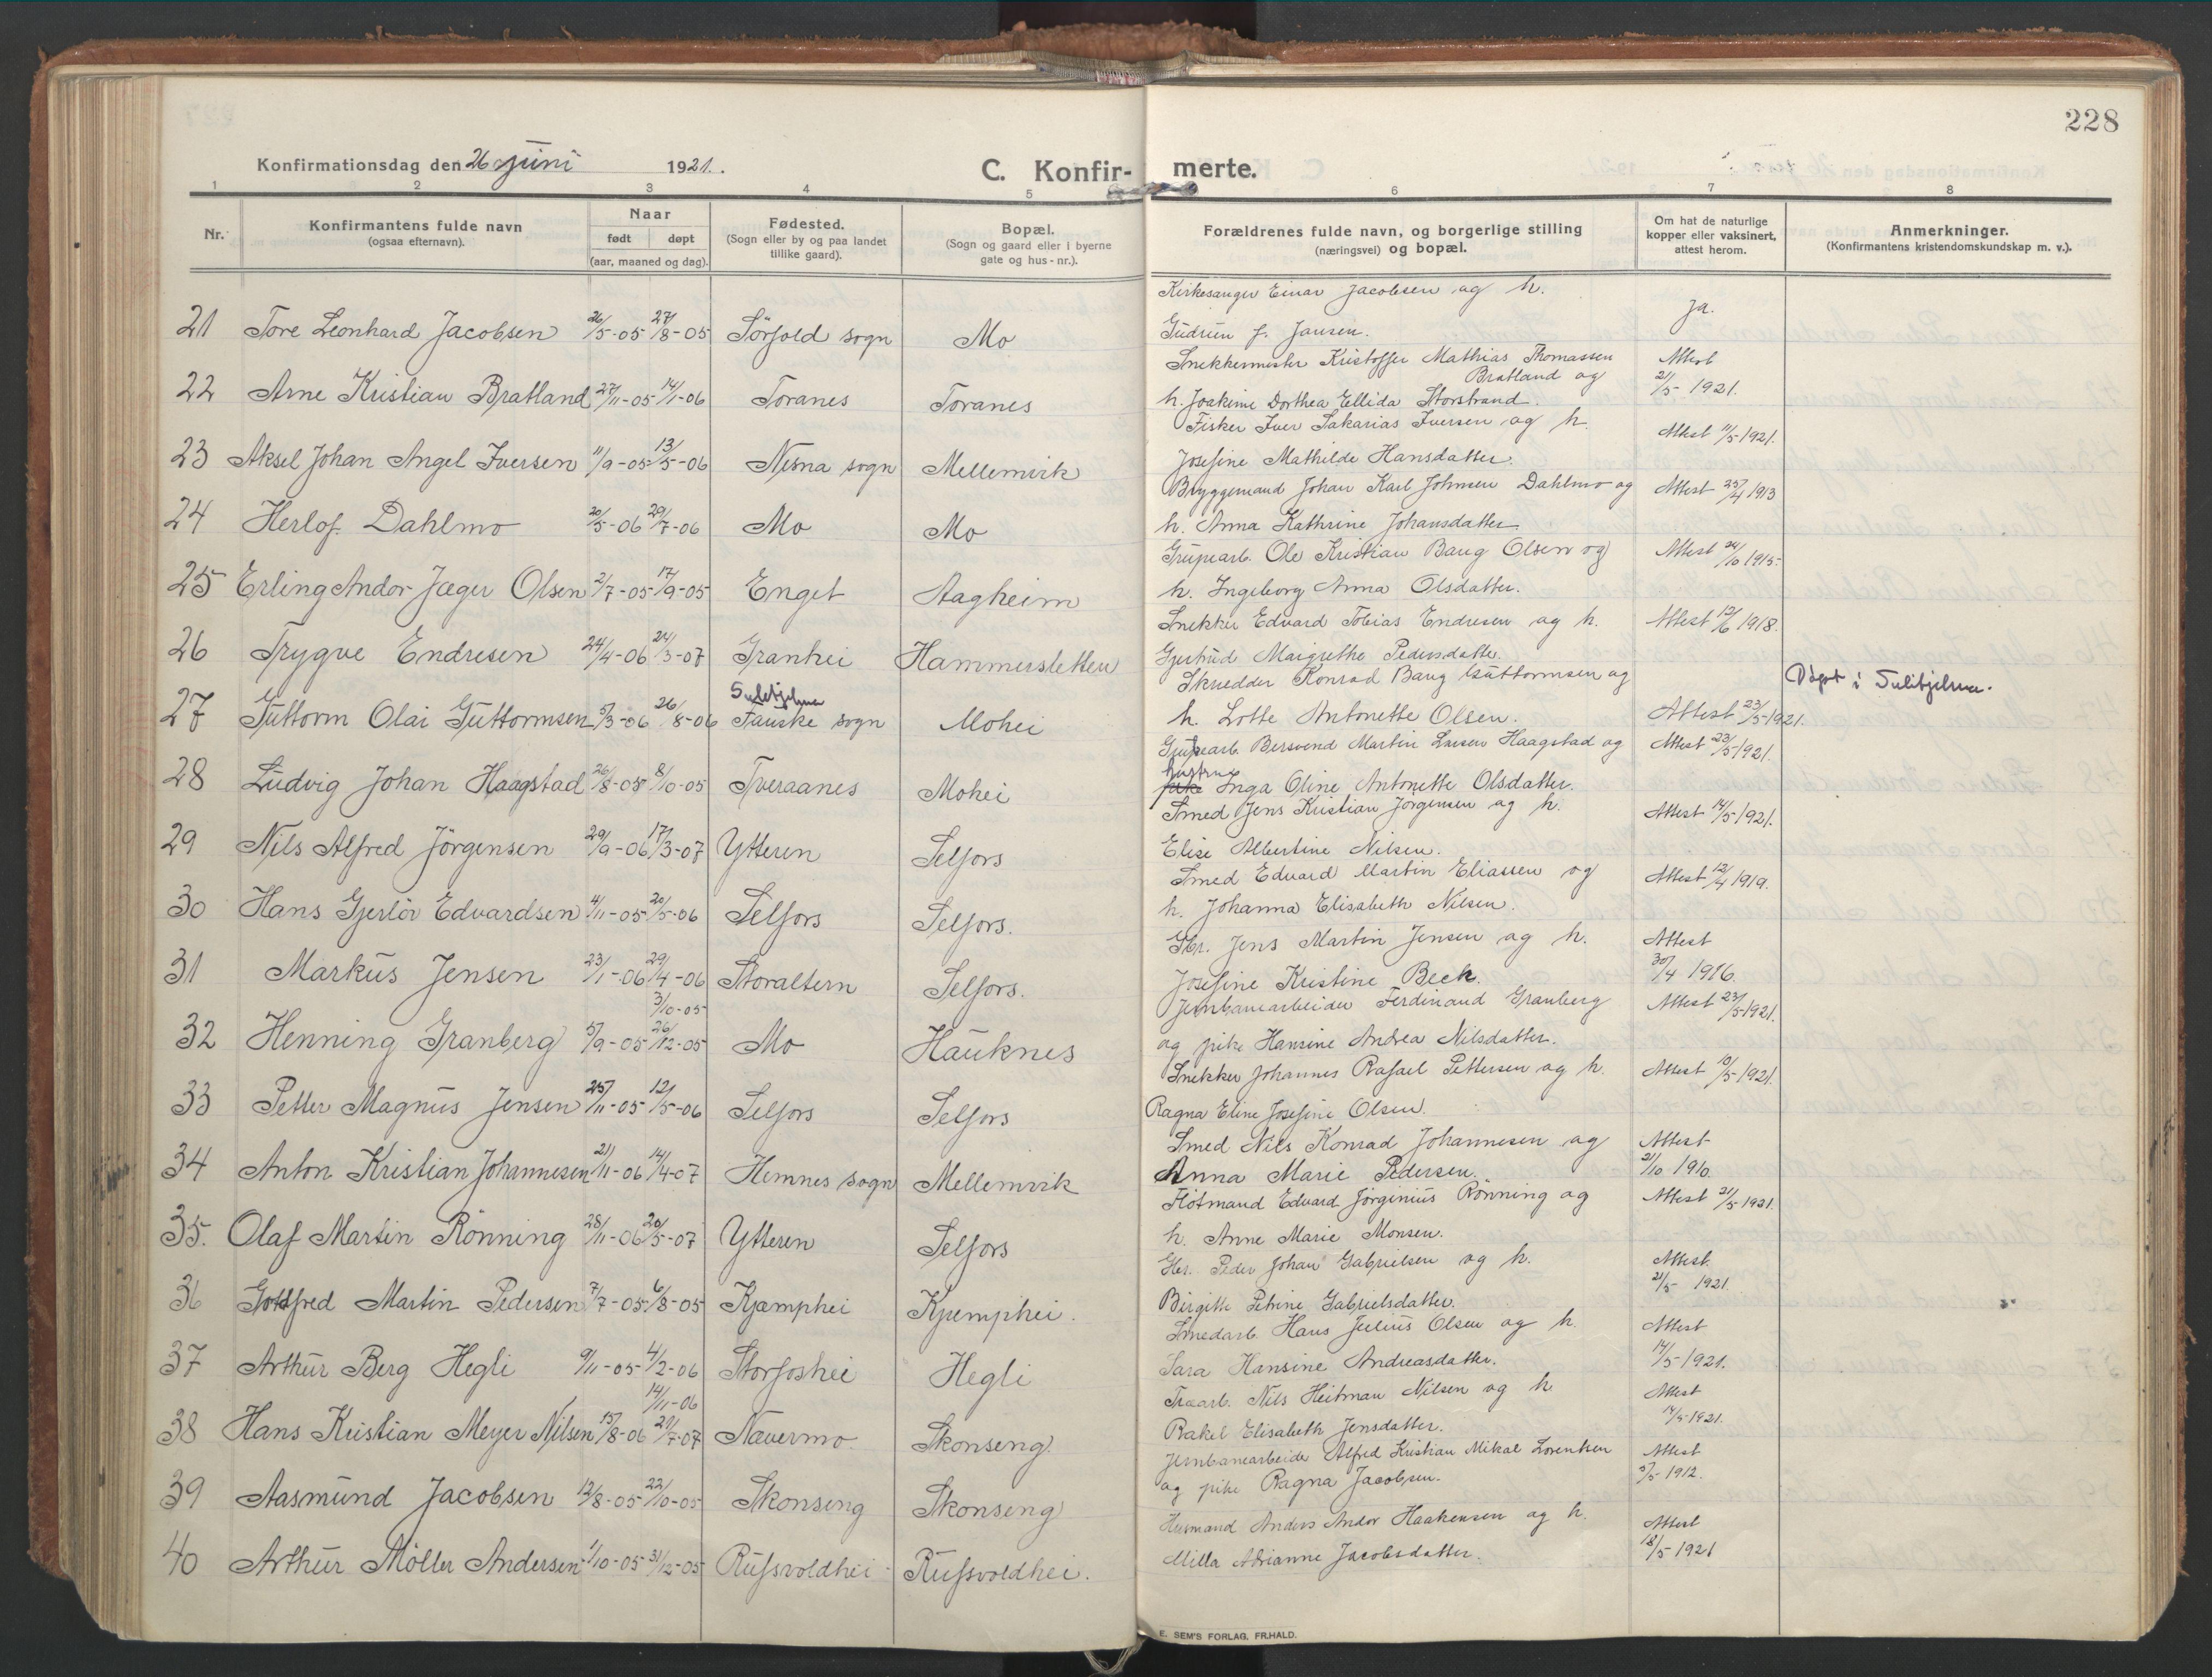 SAT, Ministerialprotokoller, klokkerbøker og fødselsregistre - Nordland, 827/L0404: Ministerialbok nr. 827A16, 1912-1925, s. 228